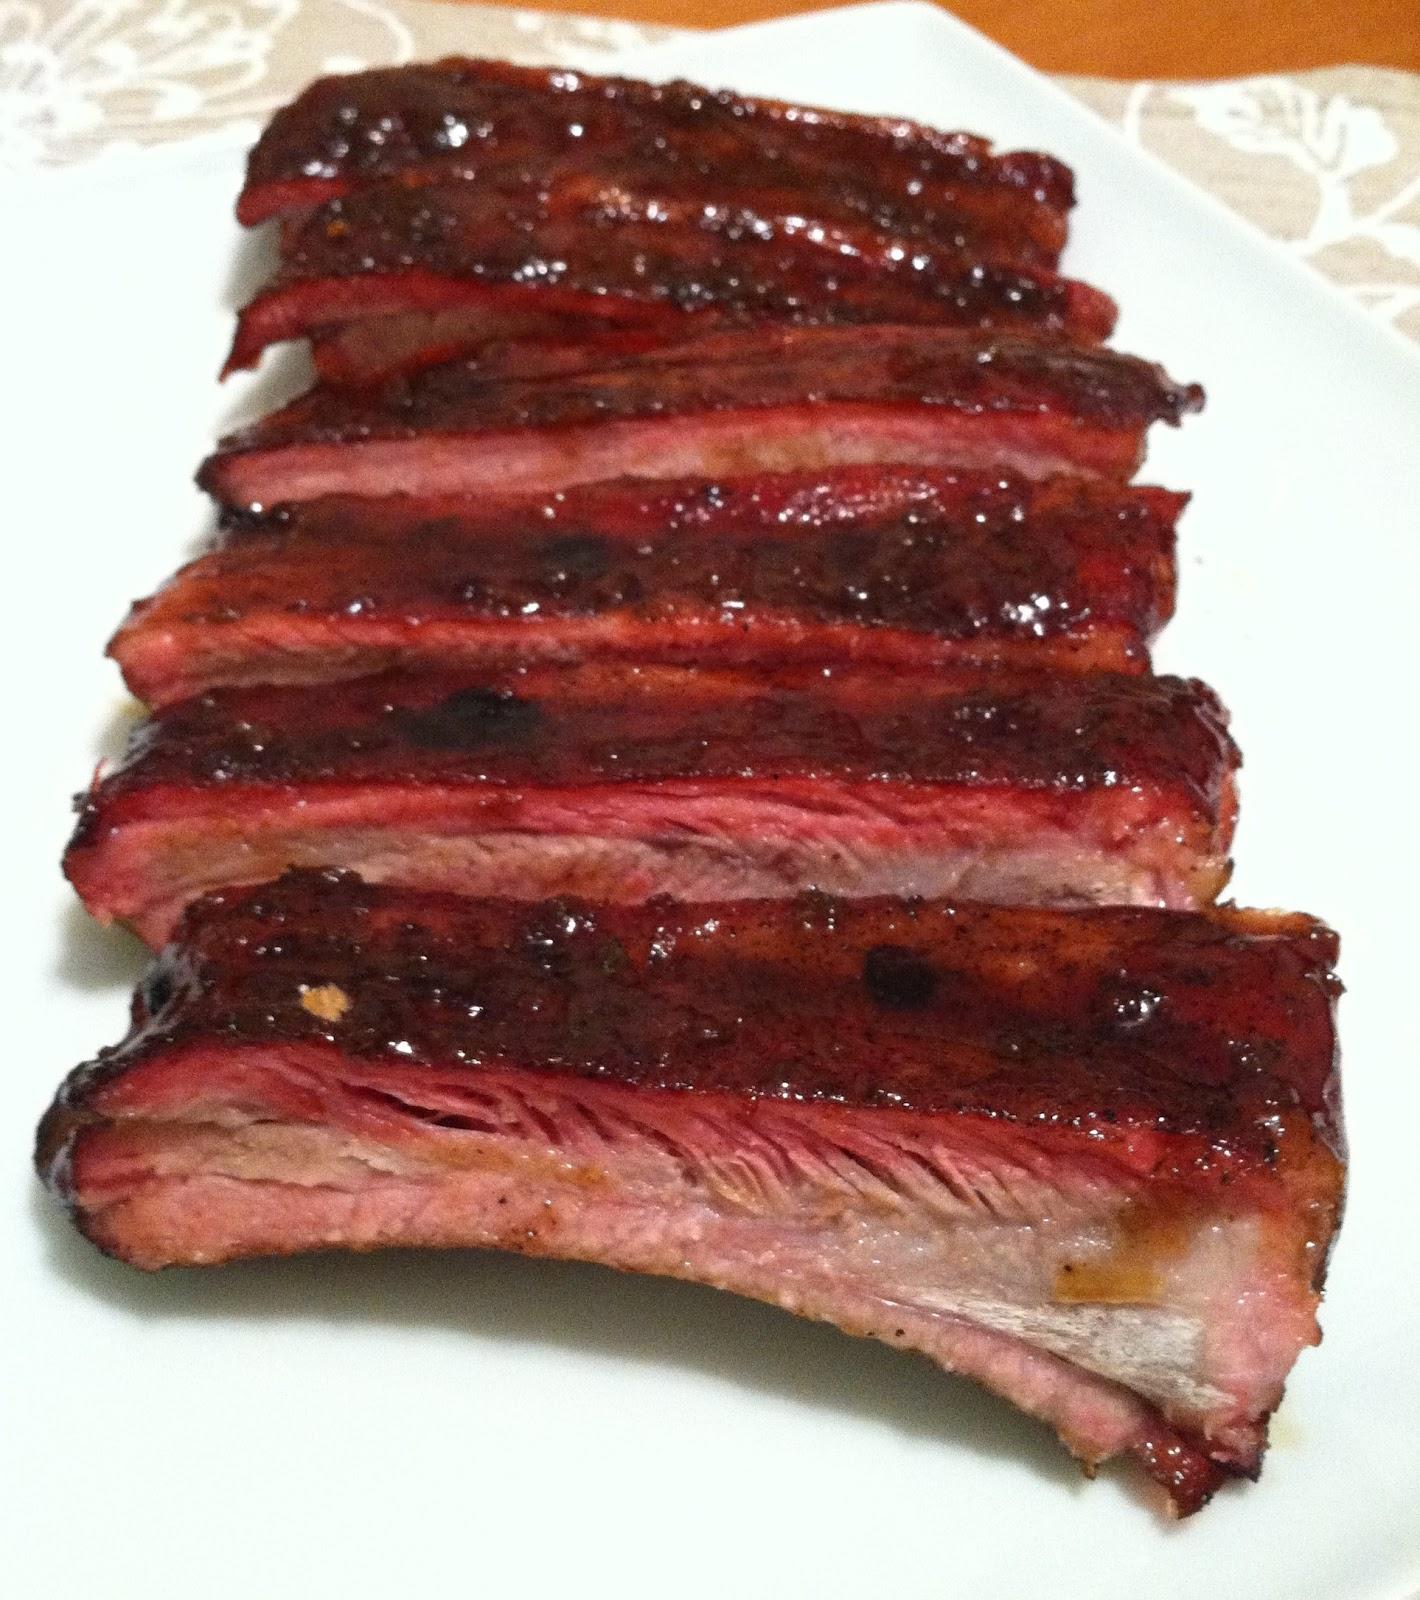 ... Smoker) Box: Adventures in BBQ Blog: Maple Sugar Dry Rub & Rib Glaze